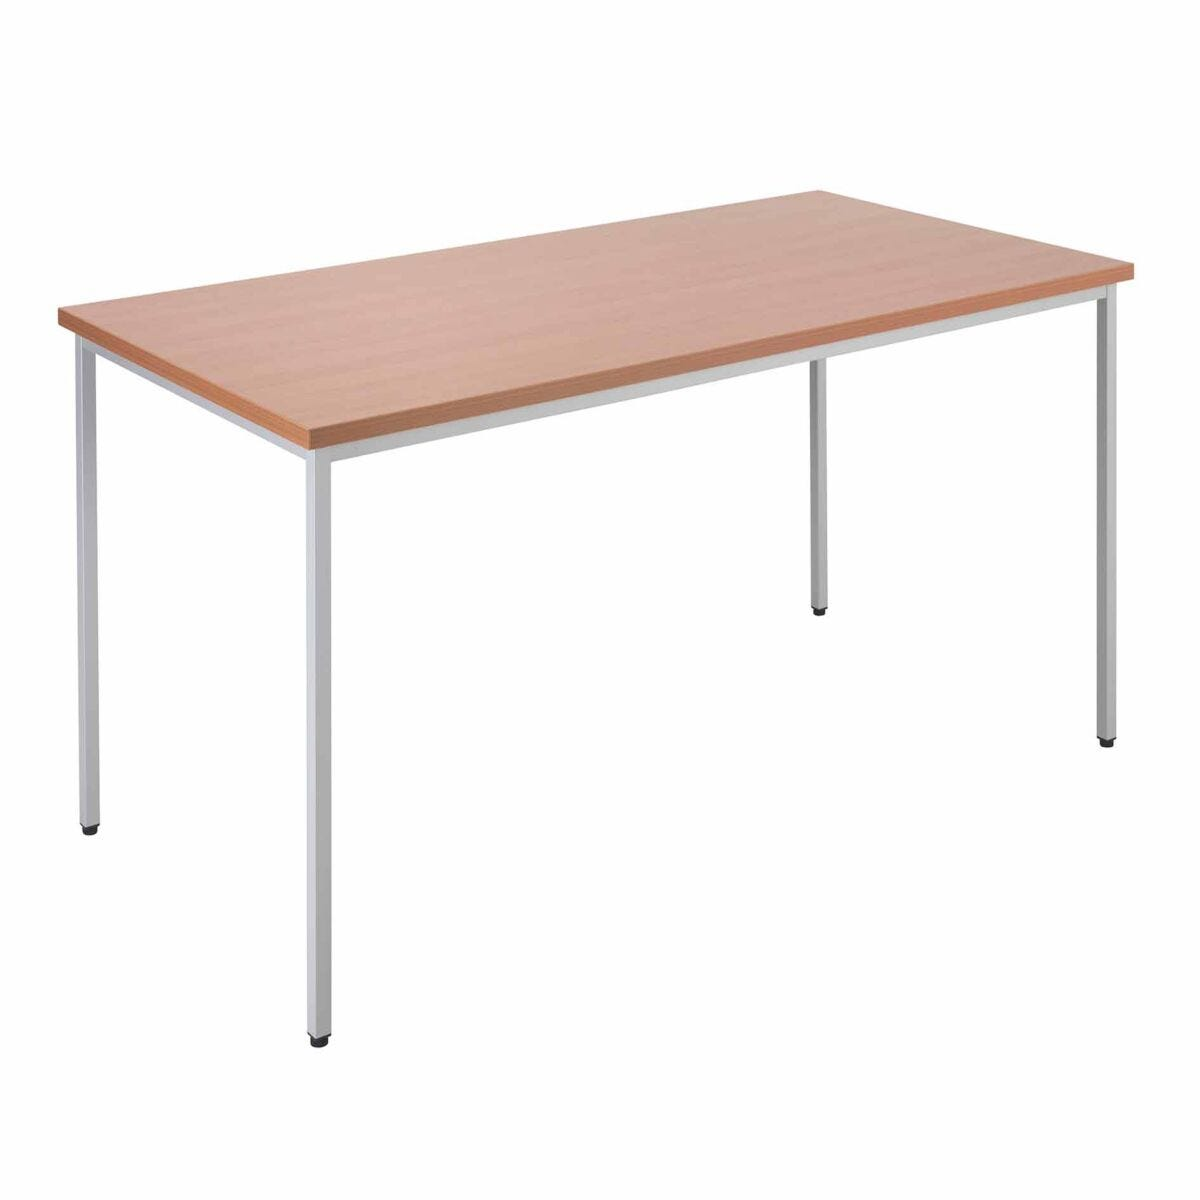 TC Office Rectangular Table 1200 x 800mm